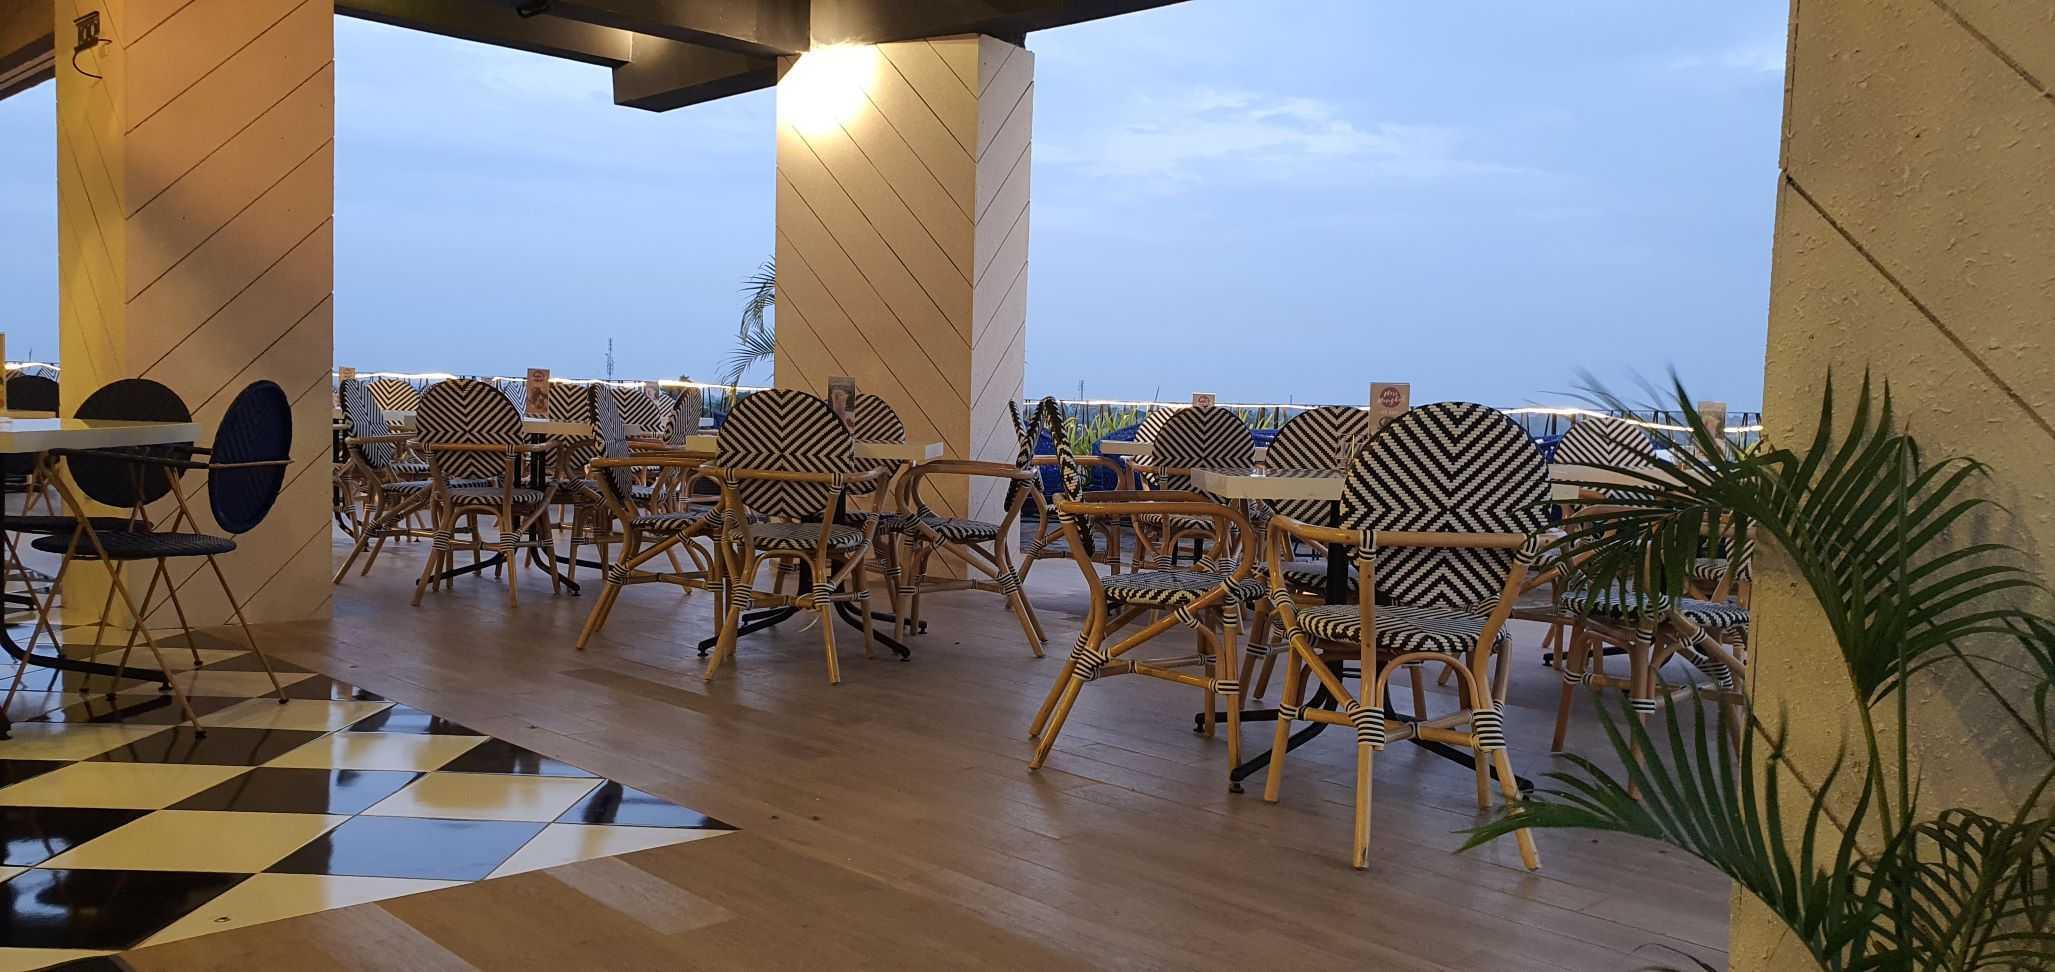 Pt Artindo Dreykarya Muda Pool Bar Prime Park Hotel Pekanbaru Pekanbaru, Kota Pekanbaru, Riau, Indonesia Pekanbaru, Kota Pekanbaru, Riau, Indonesia Pt-Artindo-Dreykarya-Muda-Pool-Bar-Prime-Park-Hotel-Pekanbaru   93997